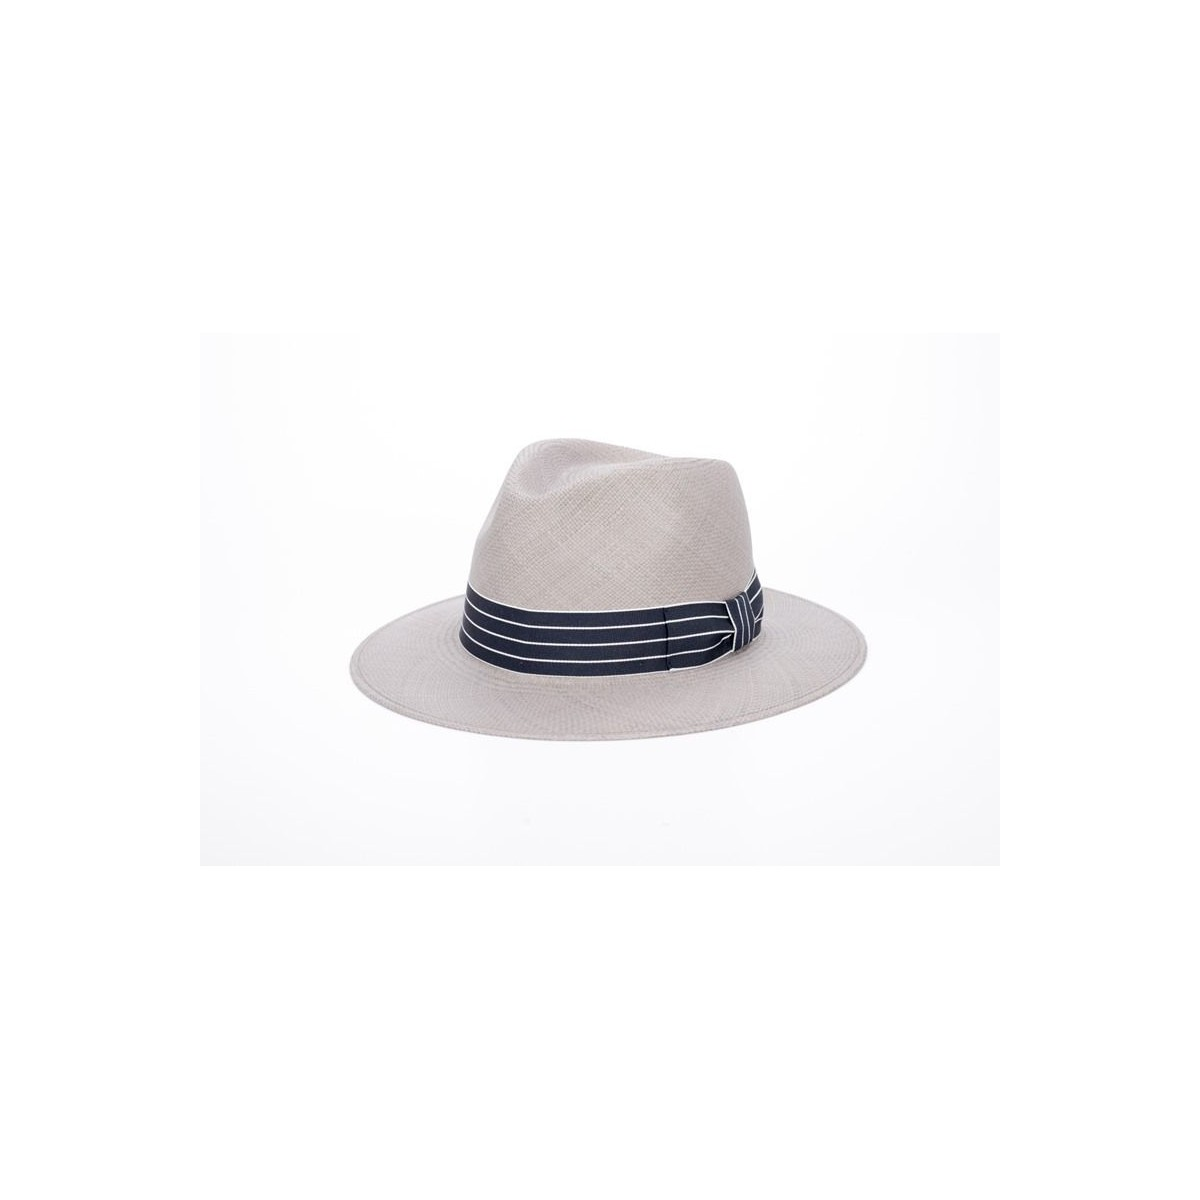 sombrero-hombre-panama-borneo-paja-toquillera-gris-Fernandez-y-Roche-1